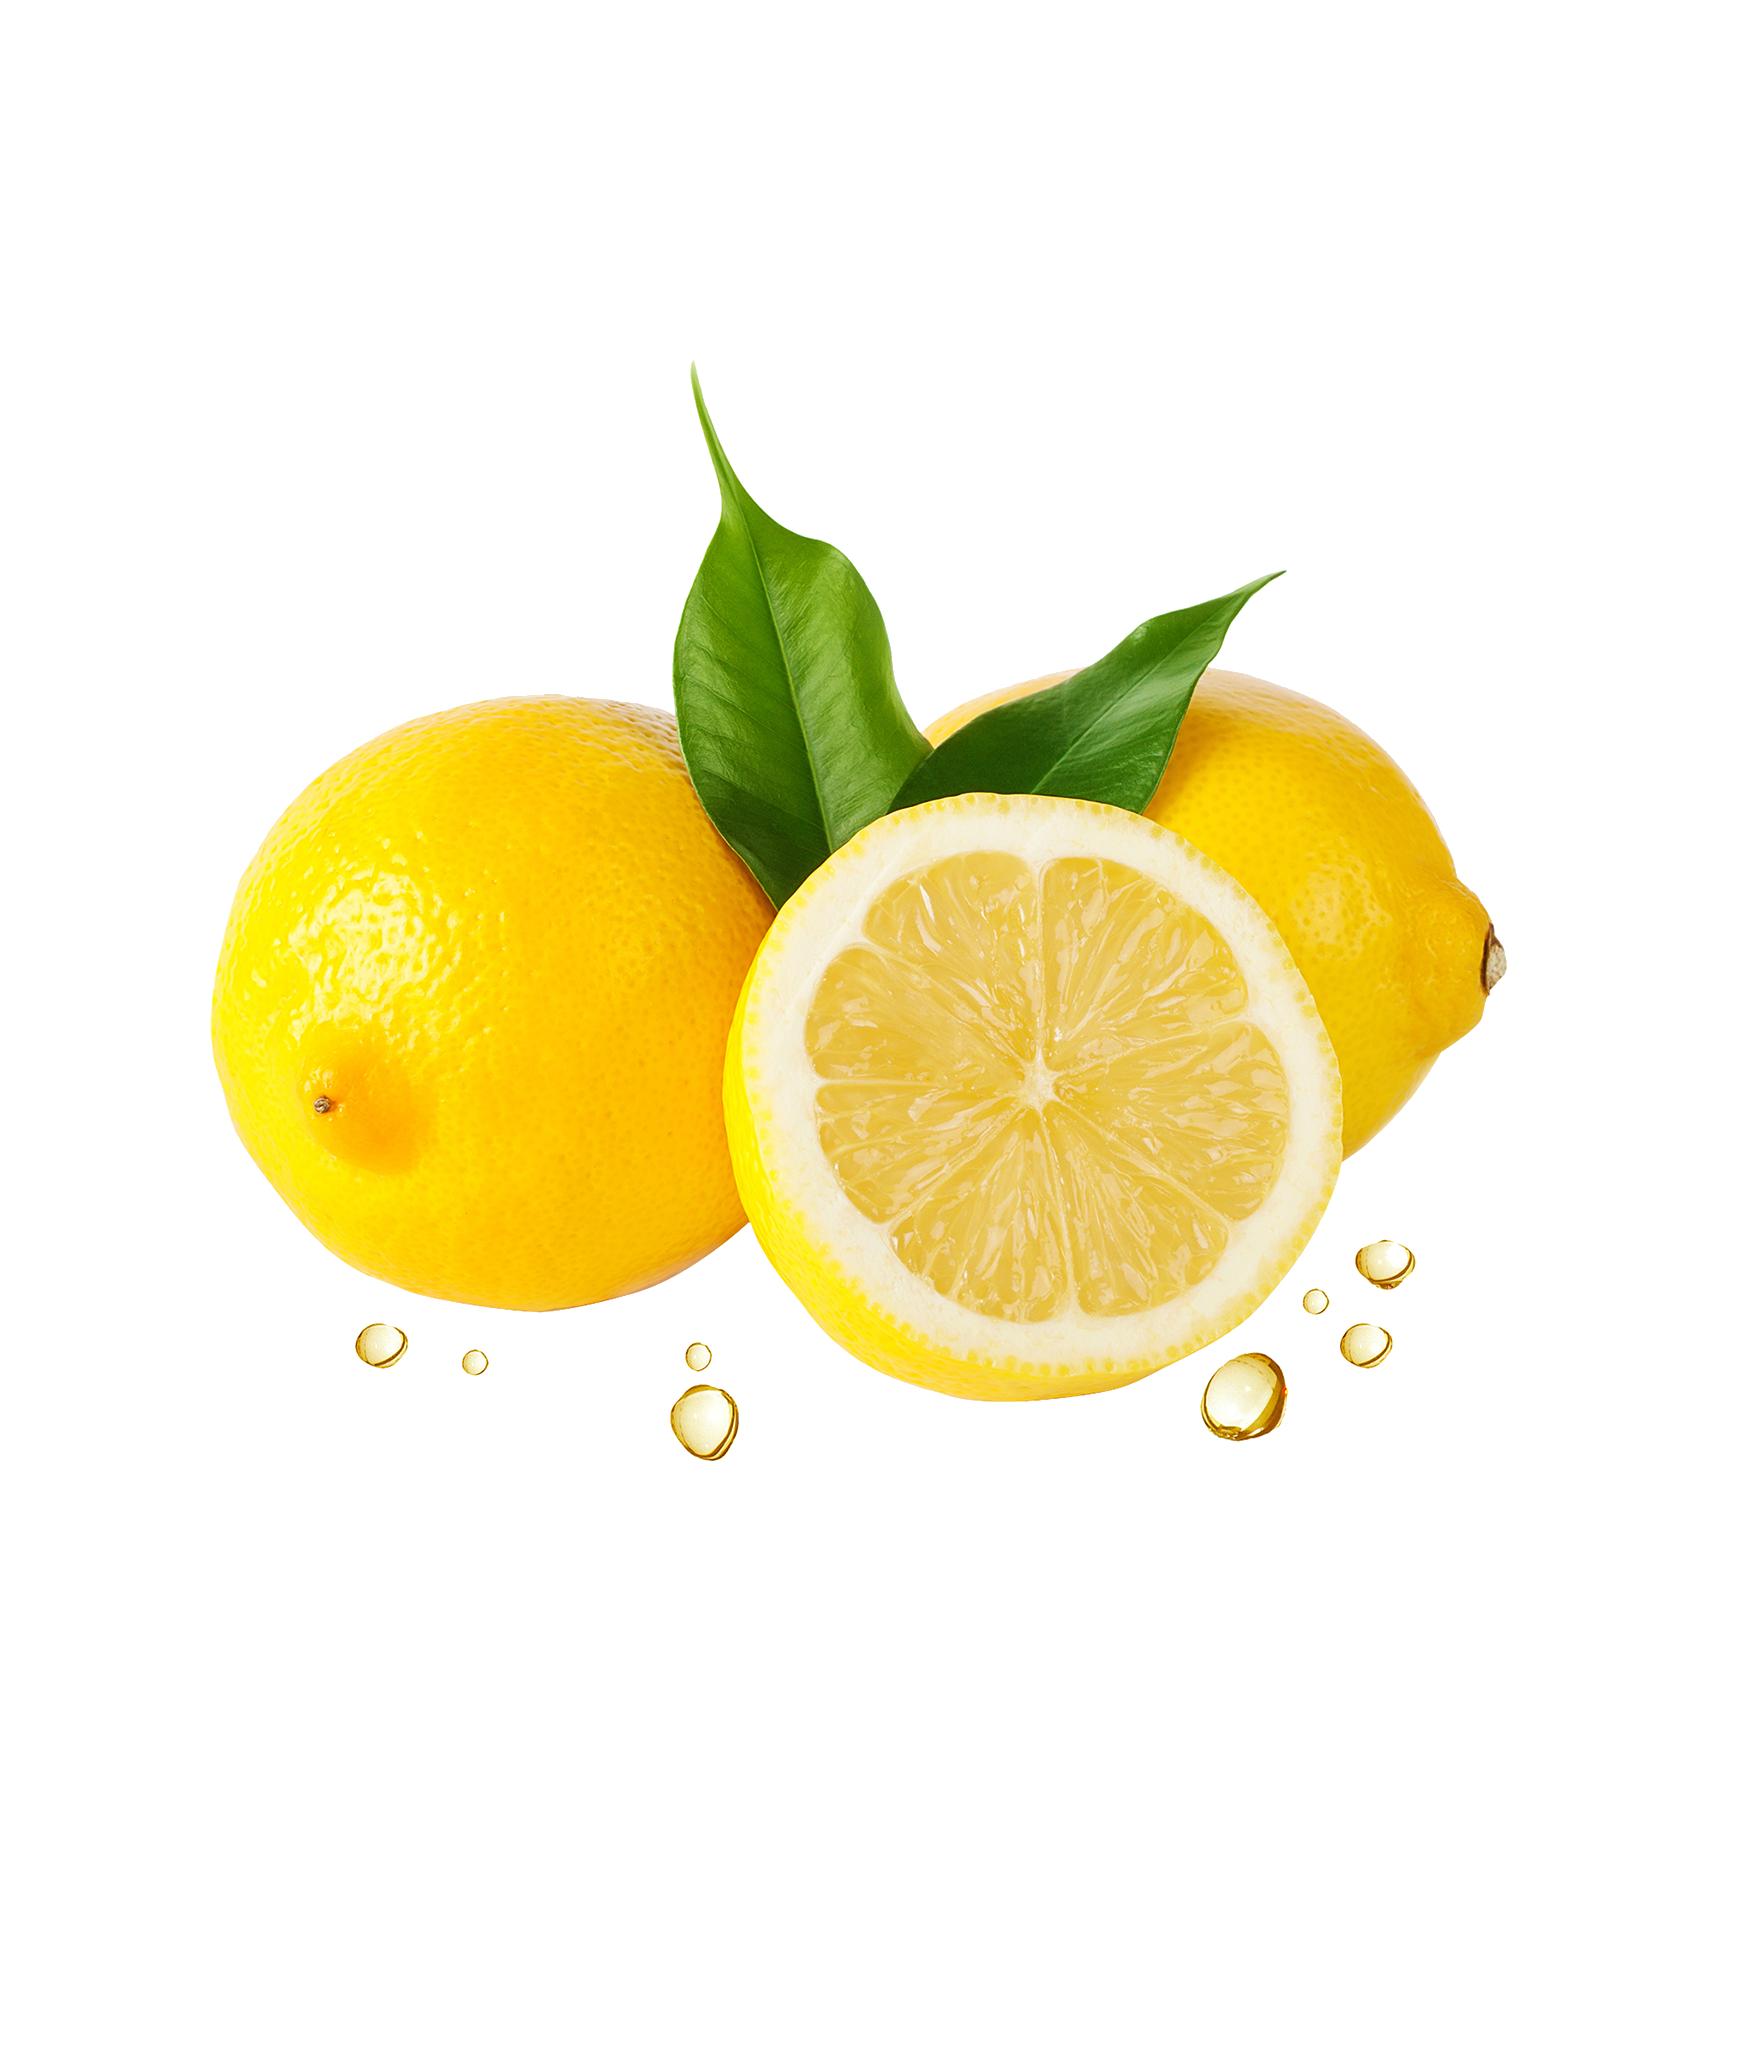 Lemons clipart sour taste. Lemon png image purepng